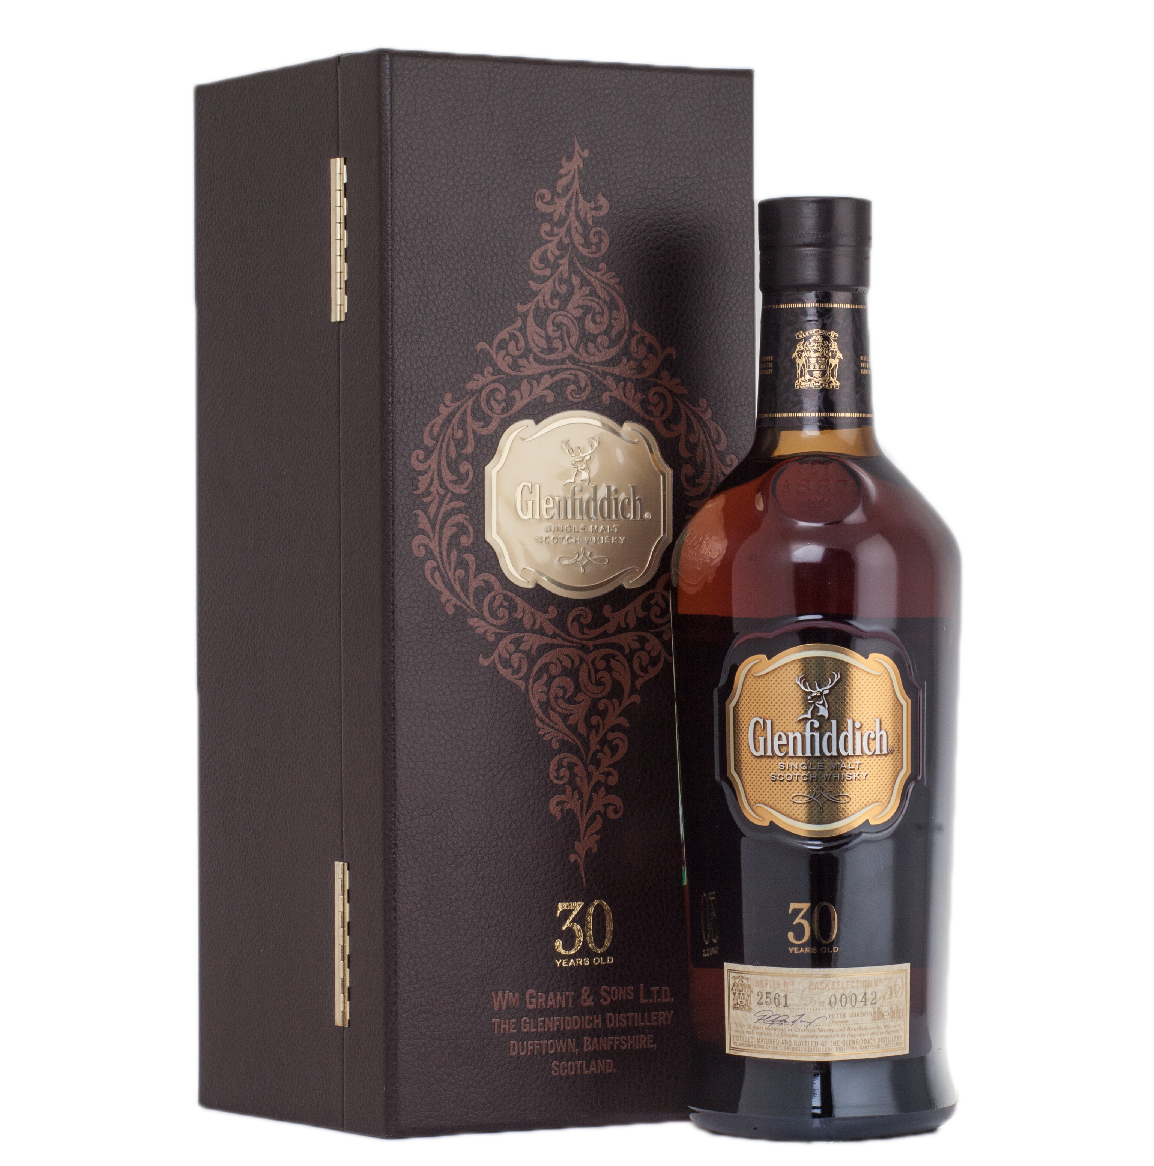 виски Гленфиддик 30 лет Шотландский виски Glenfiddich 30 years old